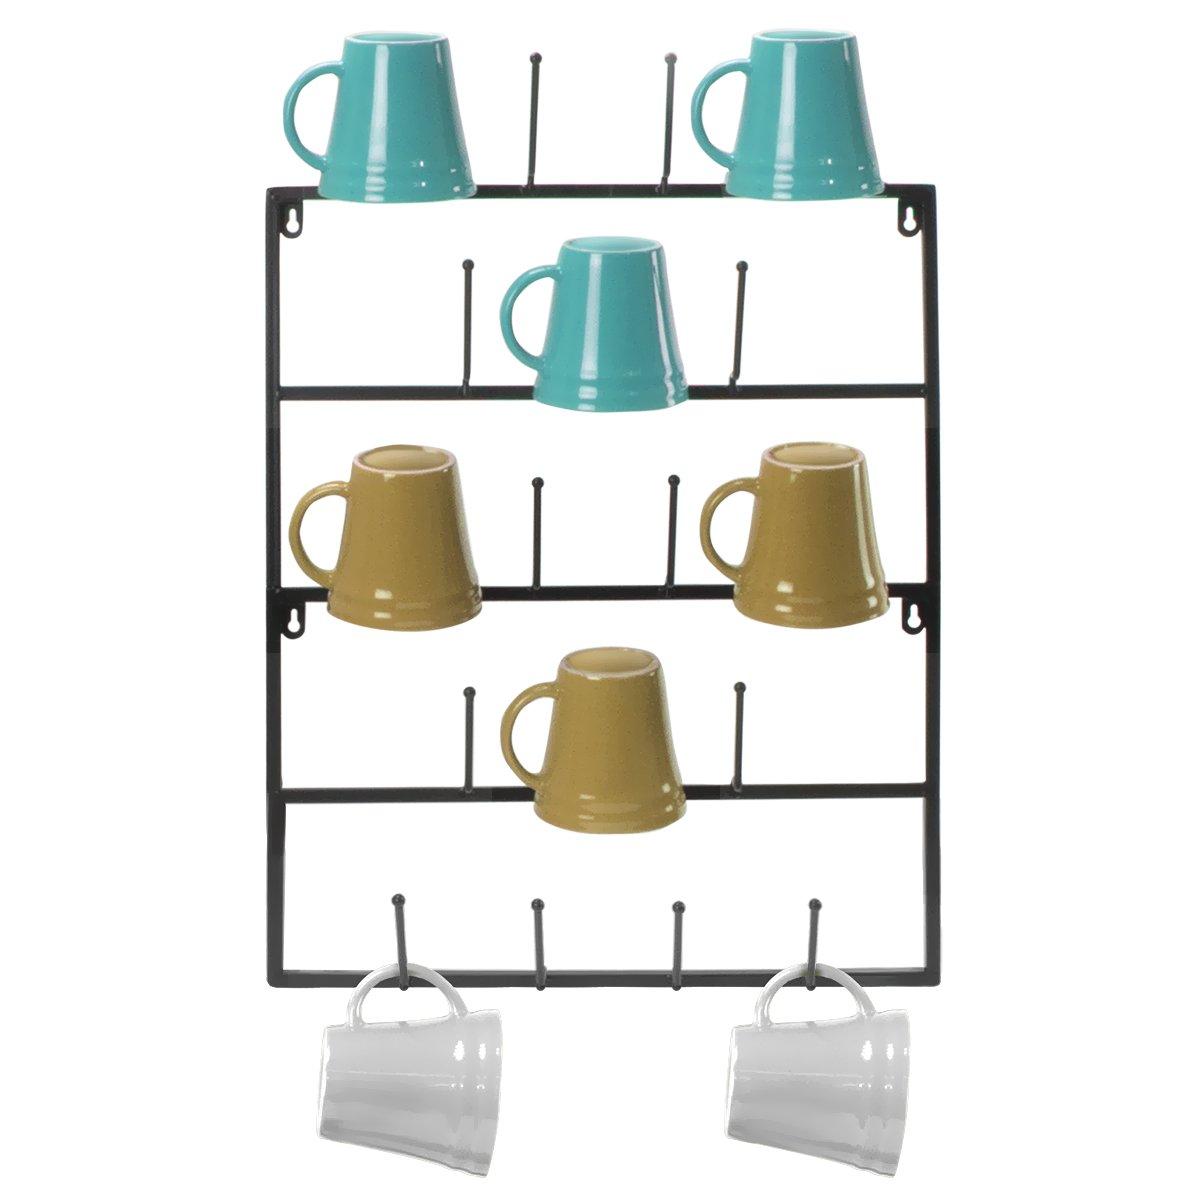 Sorbus Mug Rack Cup Holder - Wall Mounted Home Storage Mug Hooks with 5-Tier Display Organizer for Coffee Mugs, Tea Cups, Mason Jars, and More – Holds 18 Mugs – Black Metal